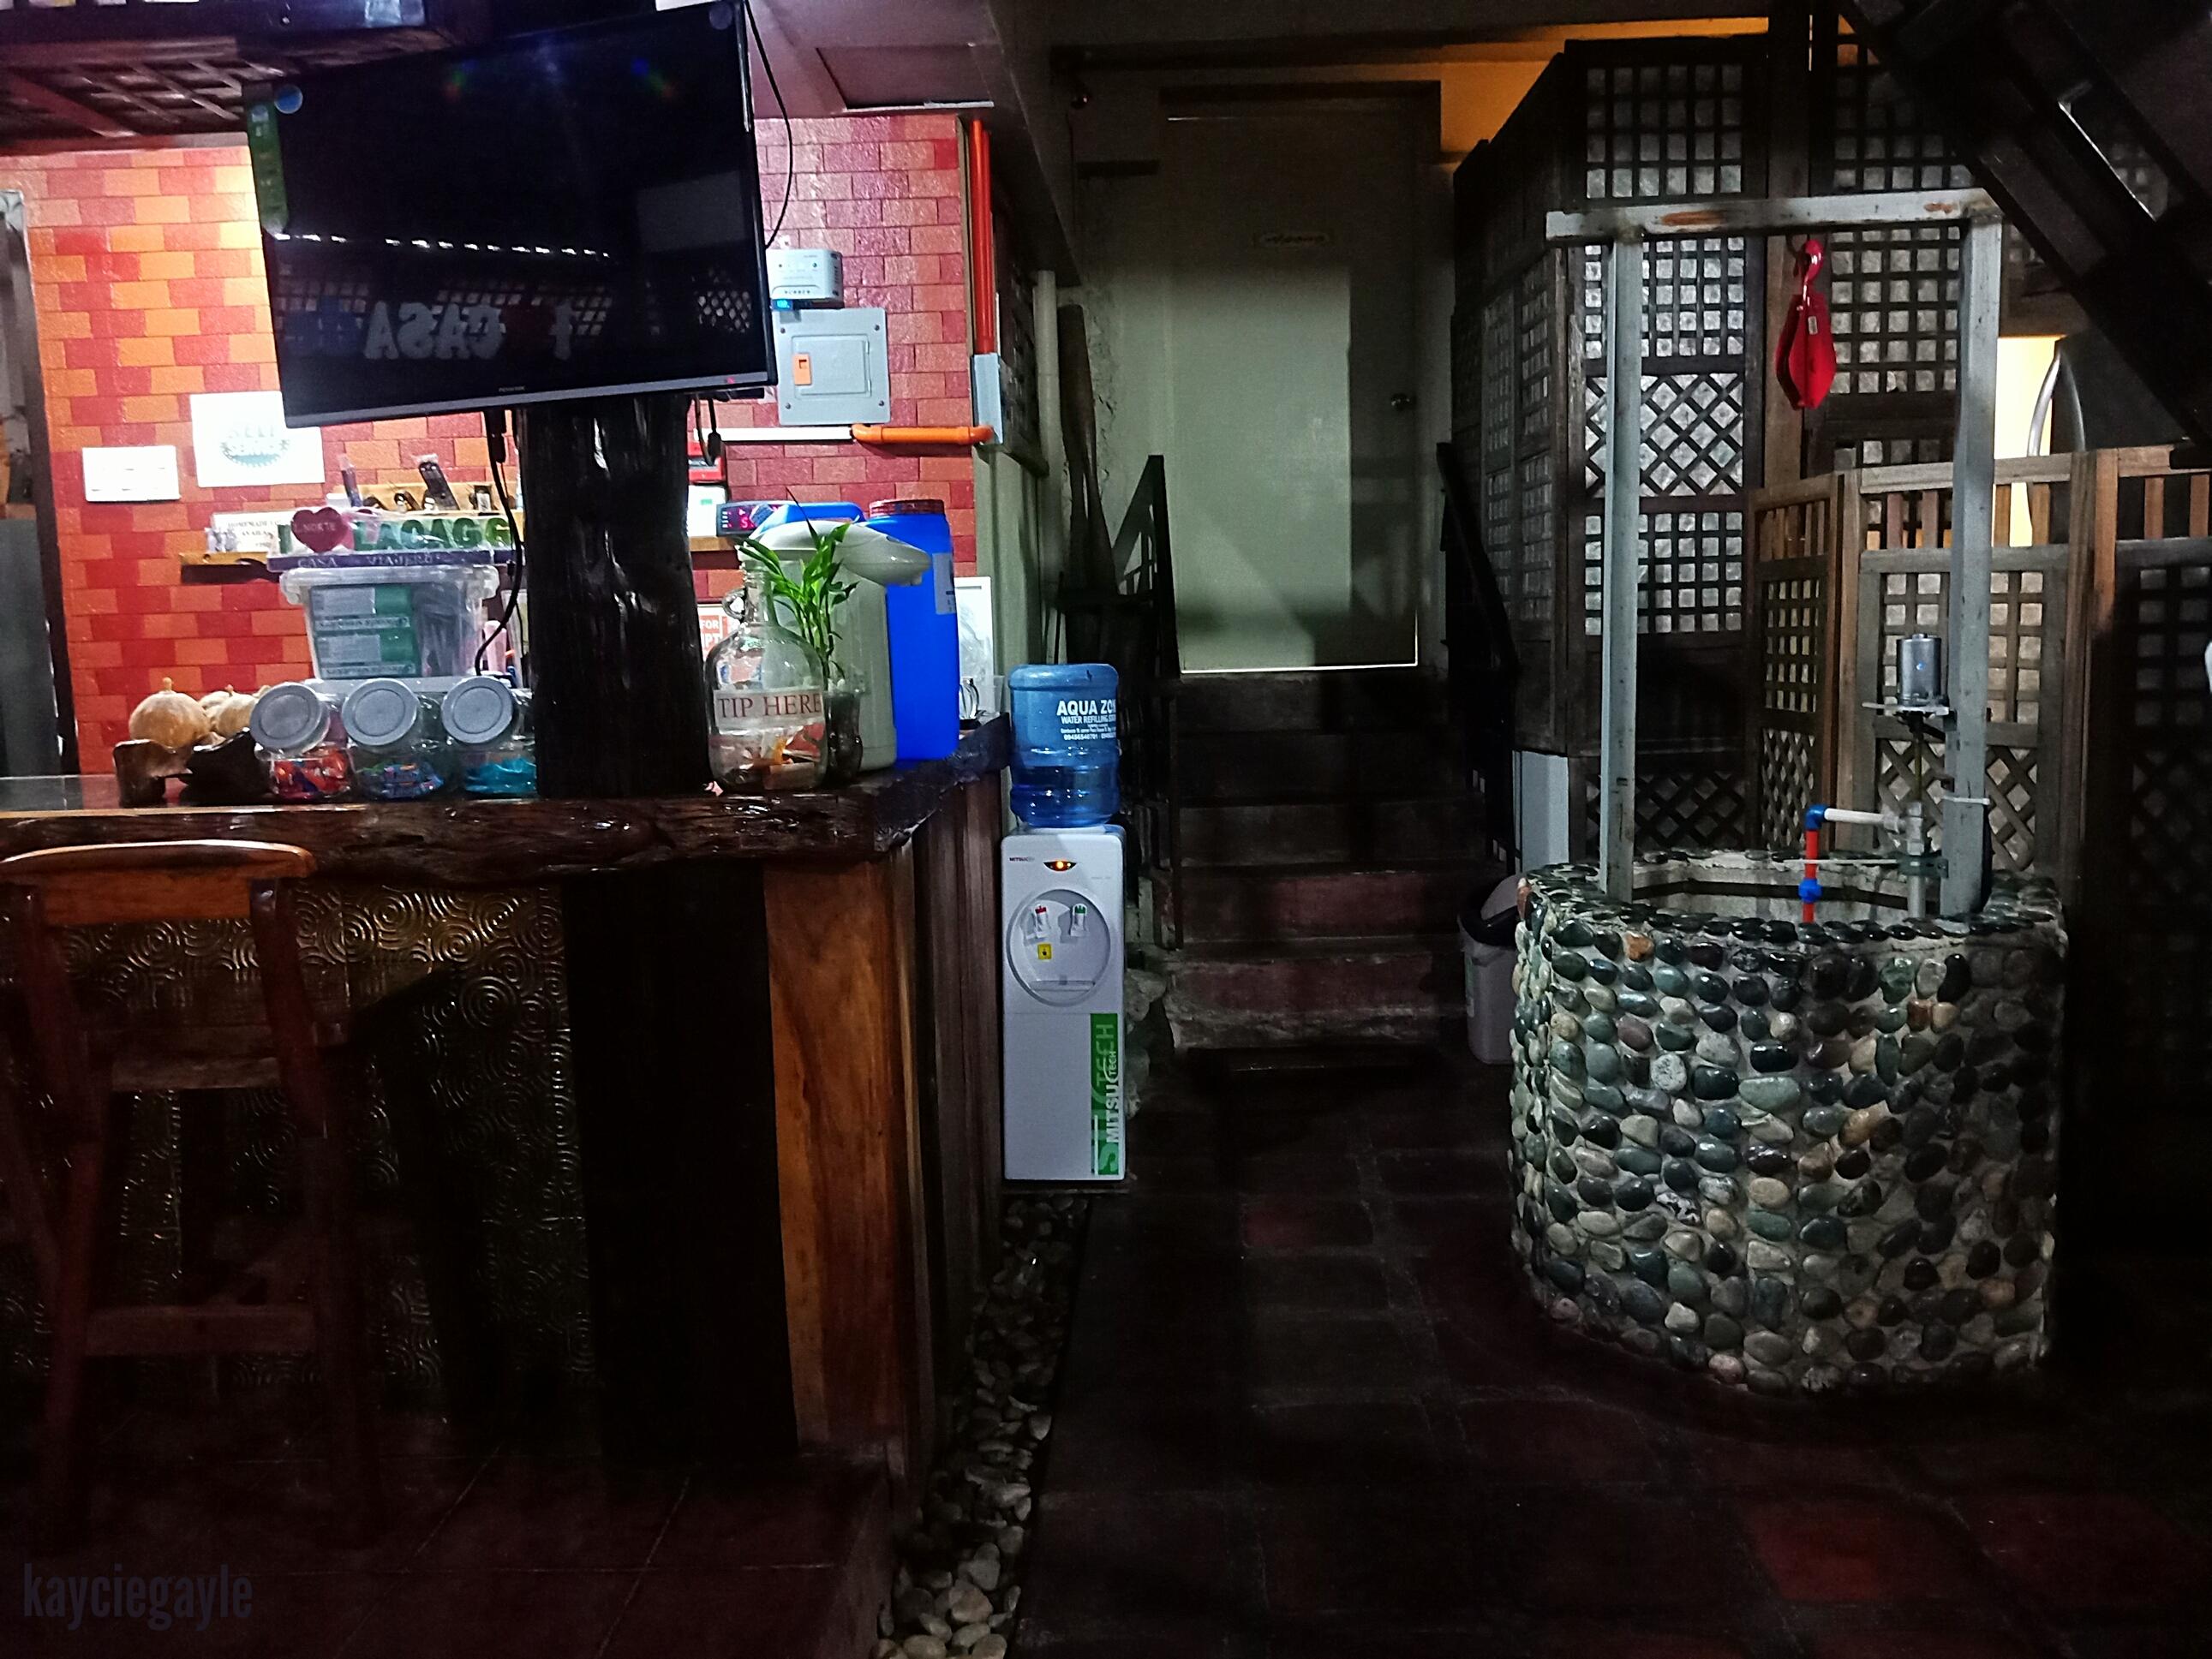 Casa de Viajero Tourist Inn Water Well